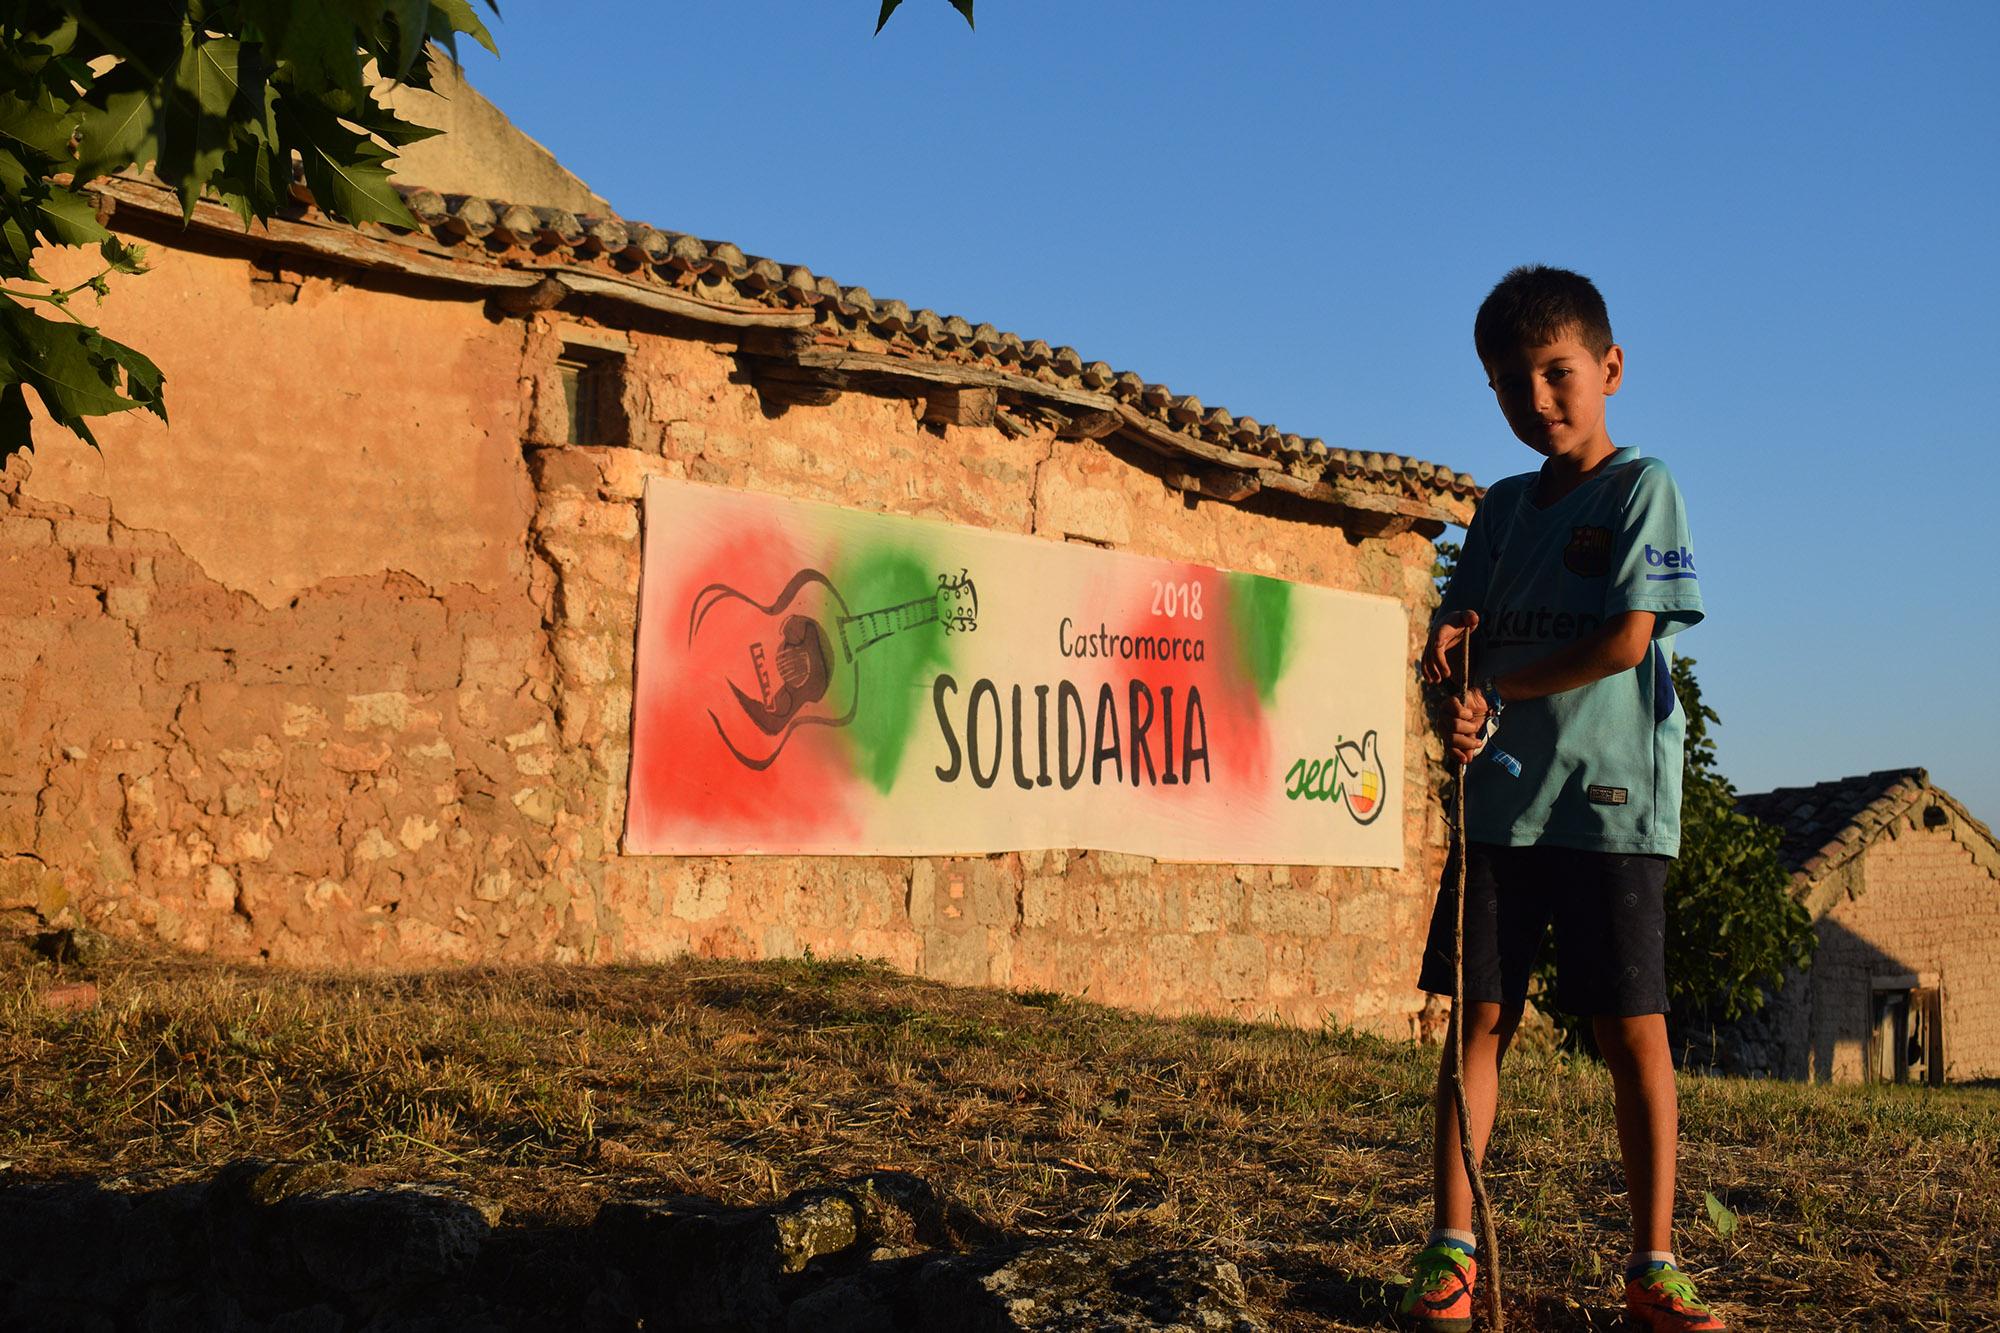 II Festival Castromorca Solidaria